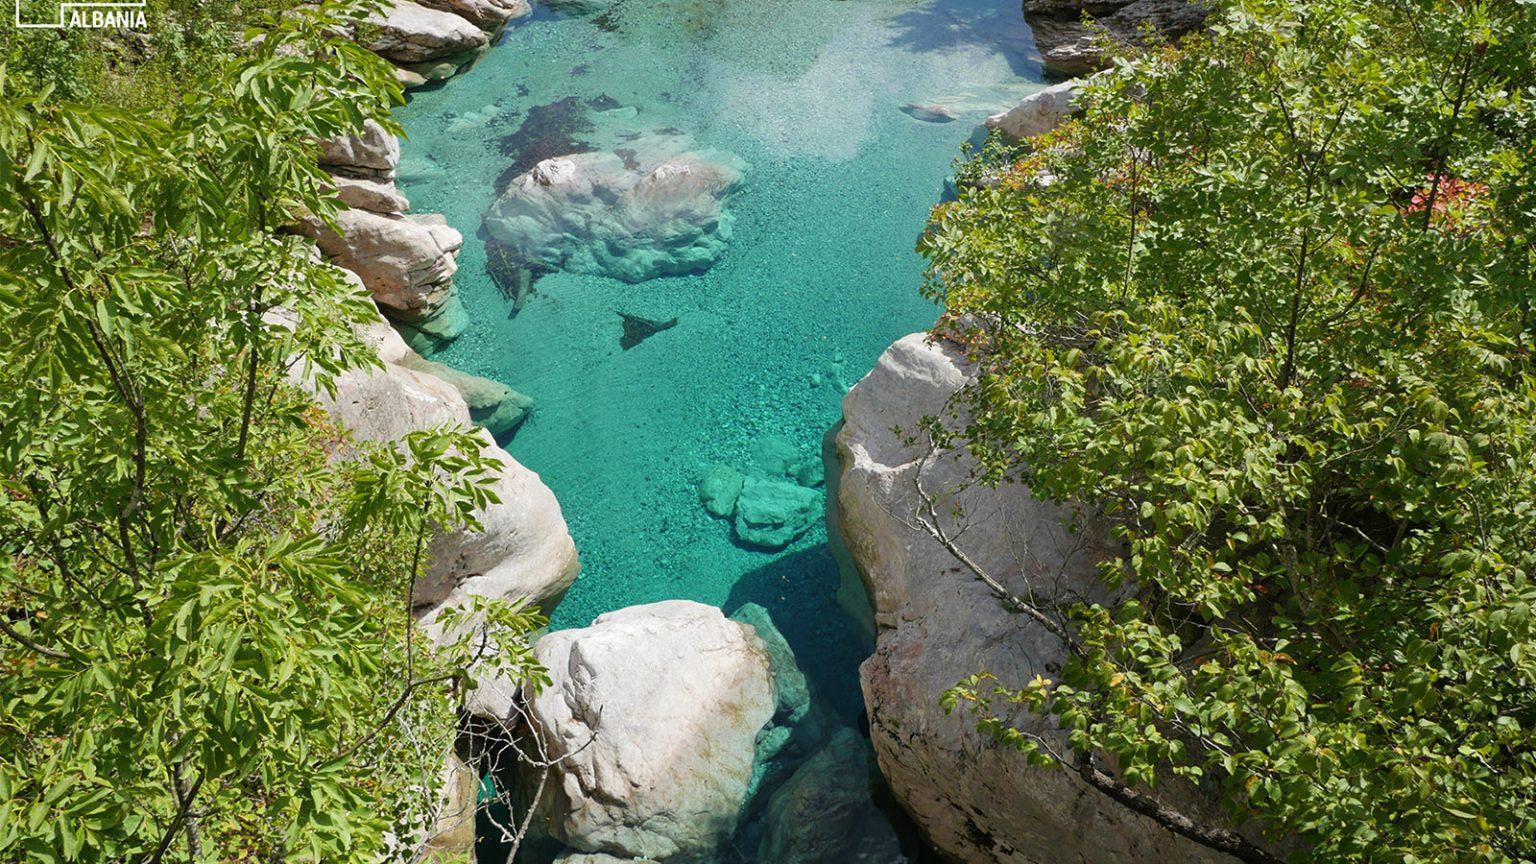 River of Theth, Shkodra, photo by IntoAlbania.